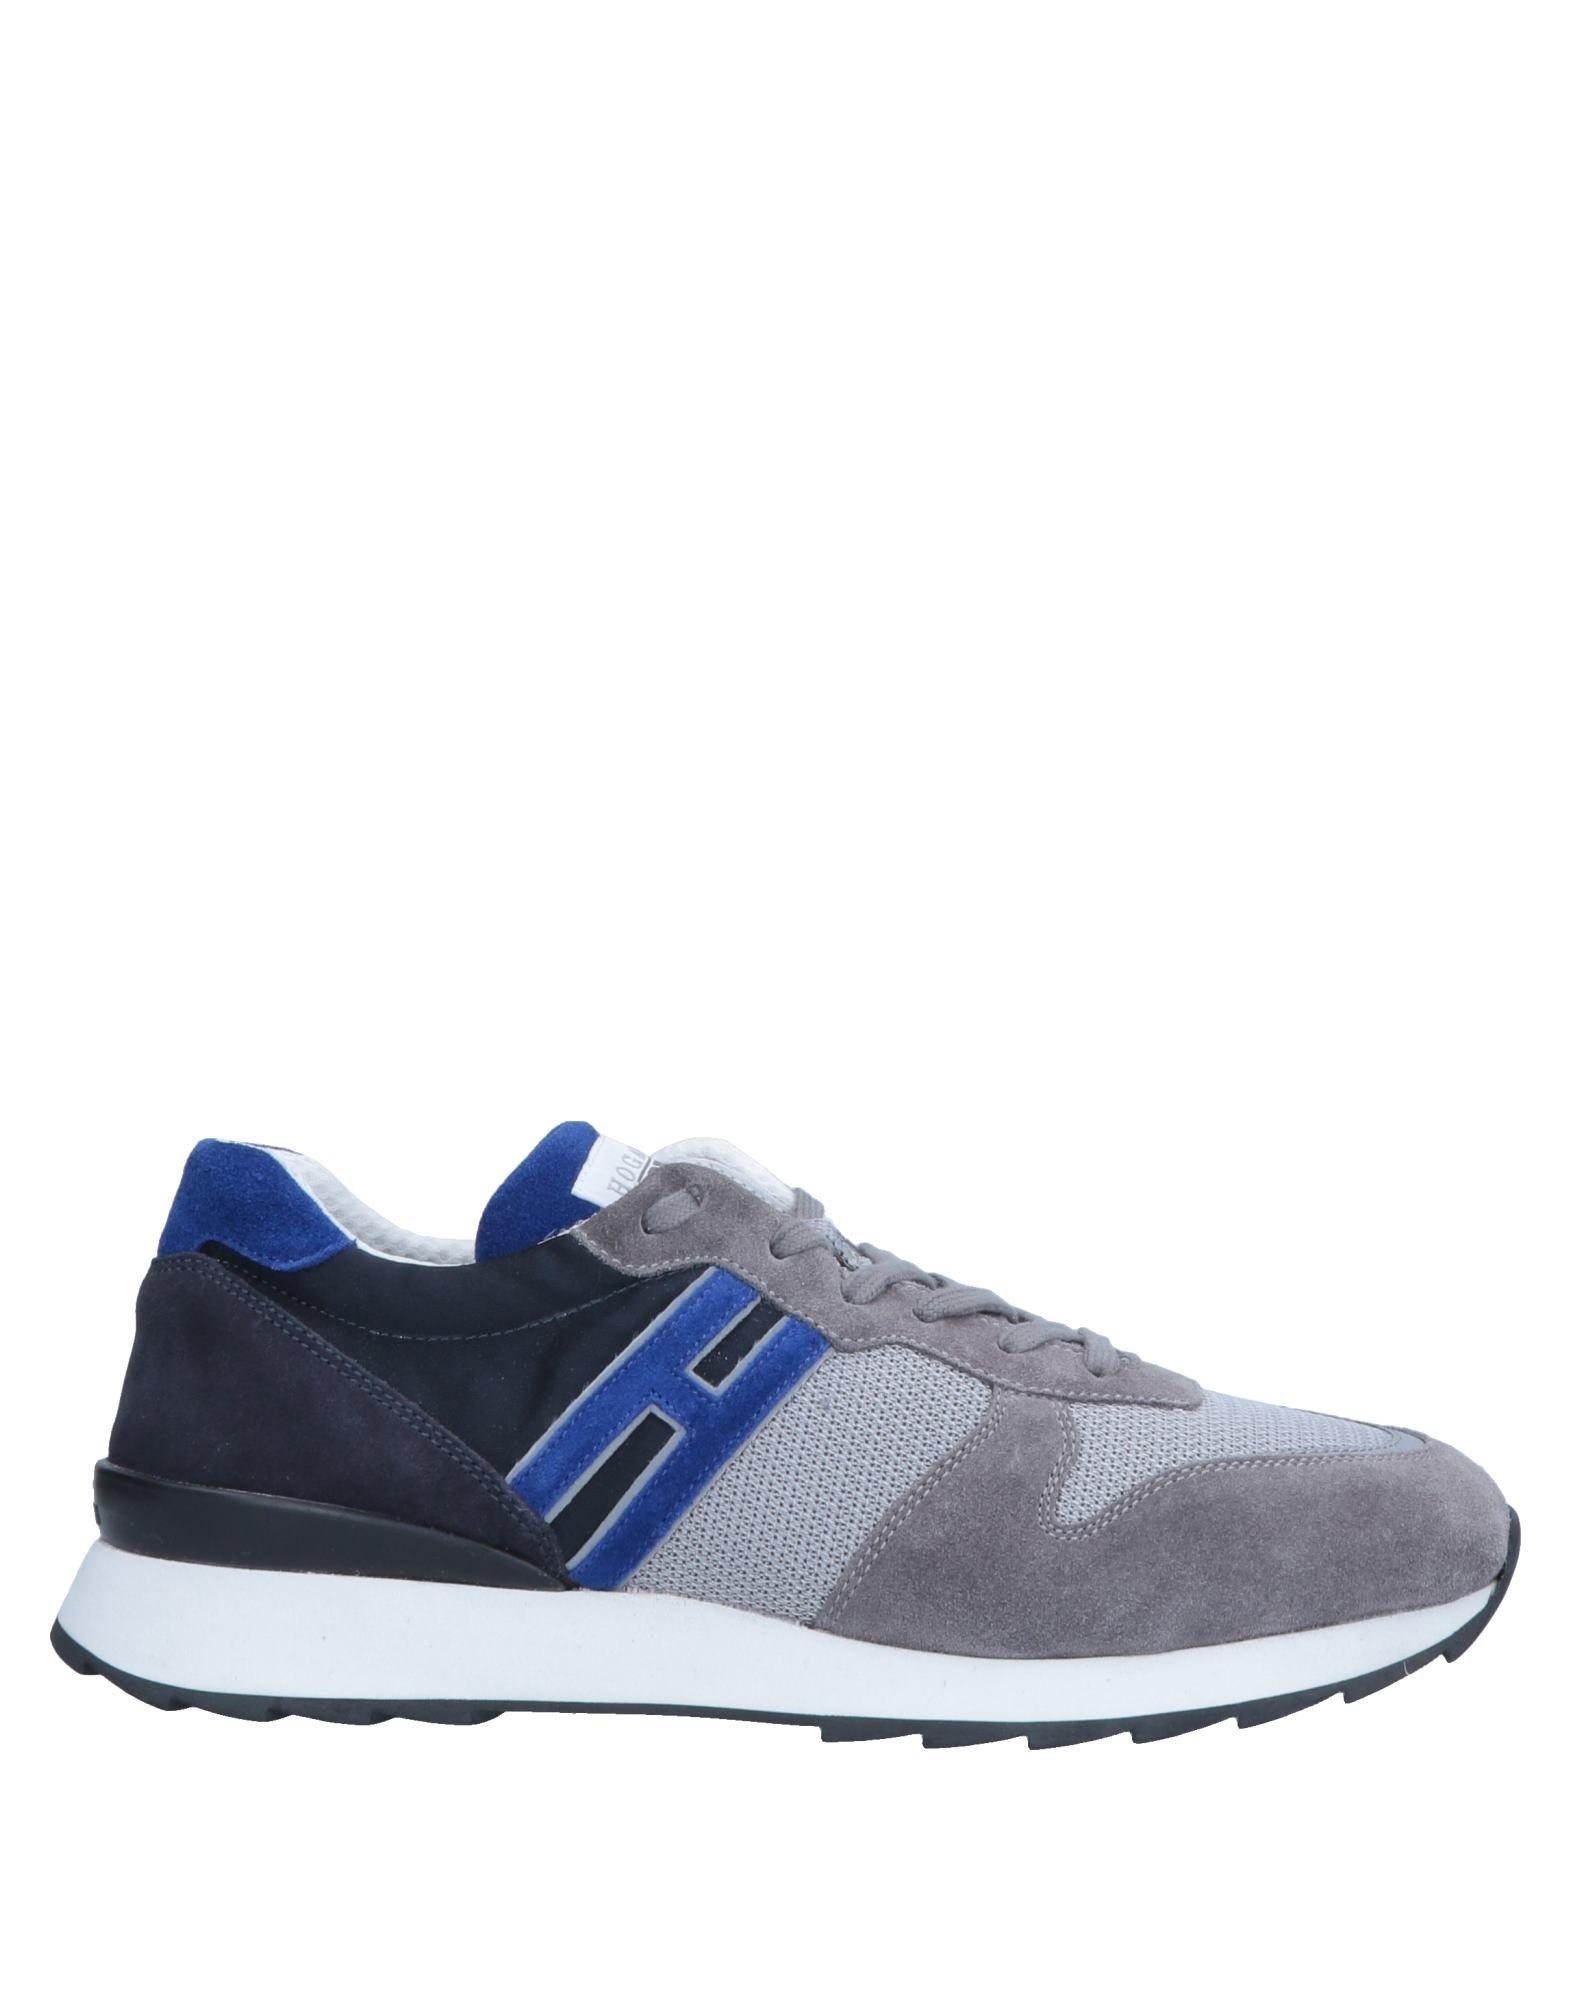 Stilvolle billige Schuhe Hogan 11564552GR Rebel Sneakers Damen  11564552GR Hogan 1564c0